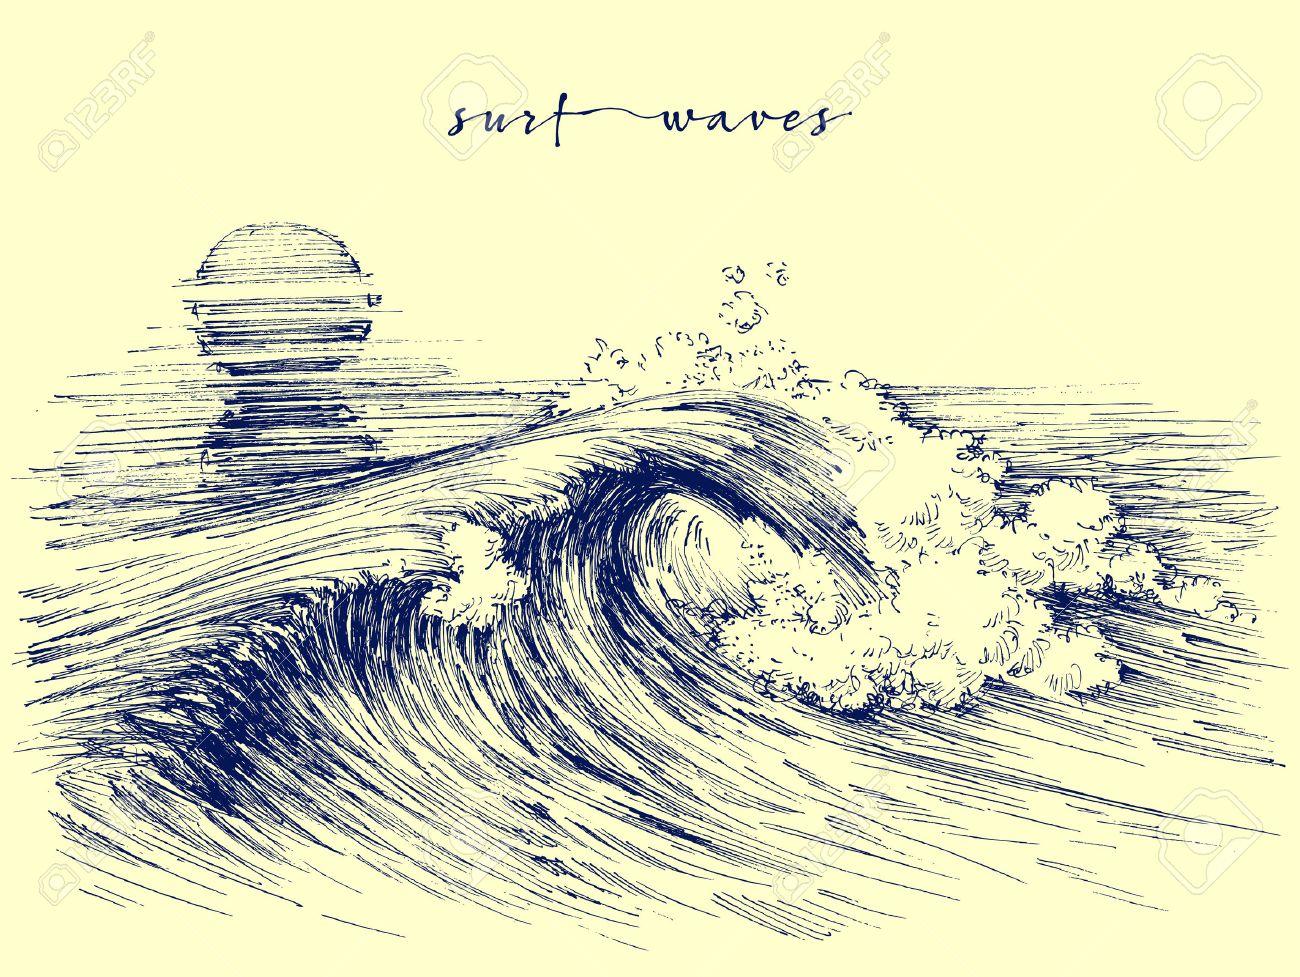 Surf waves. Sea waves graphic. Ocean wave sketch - 58703005